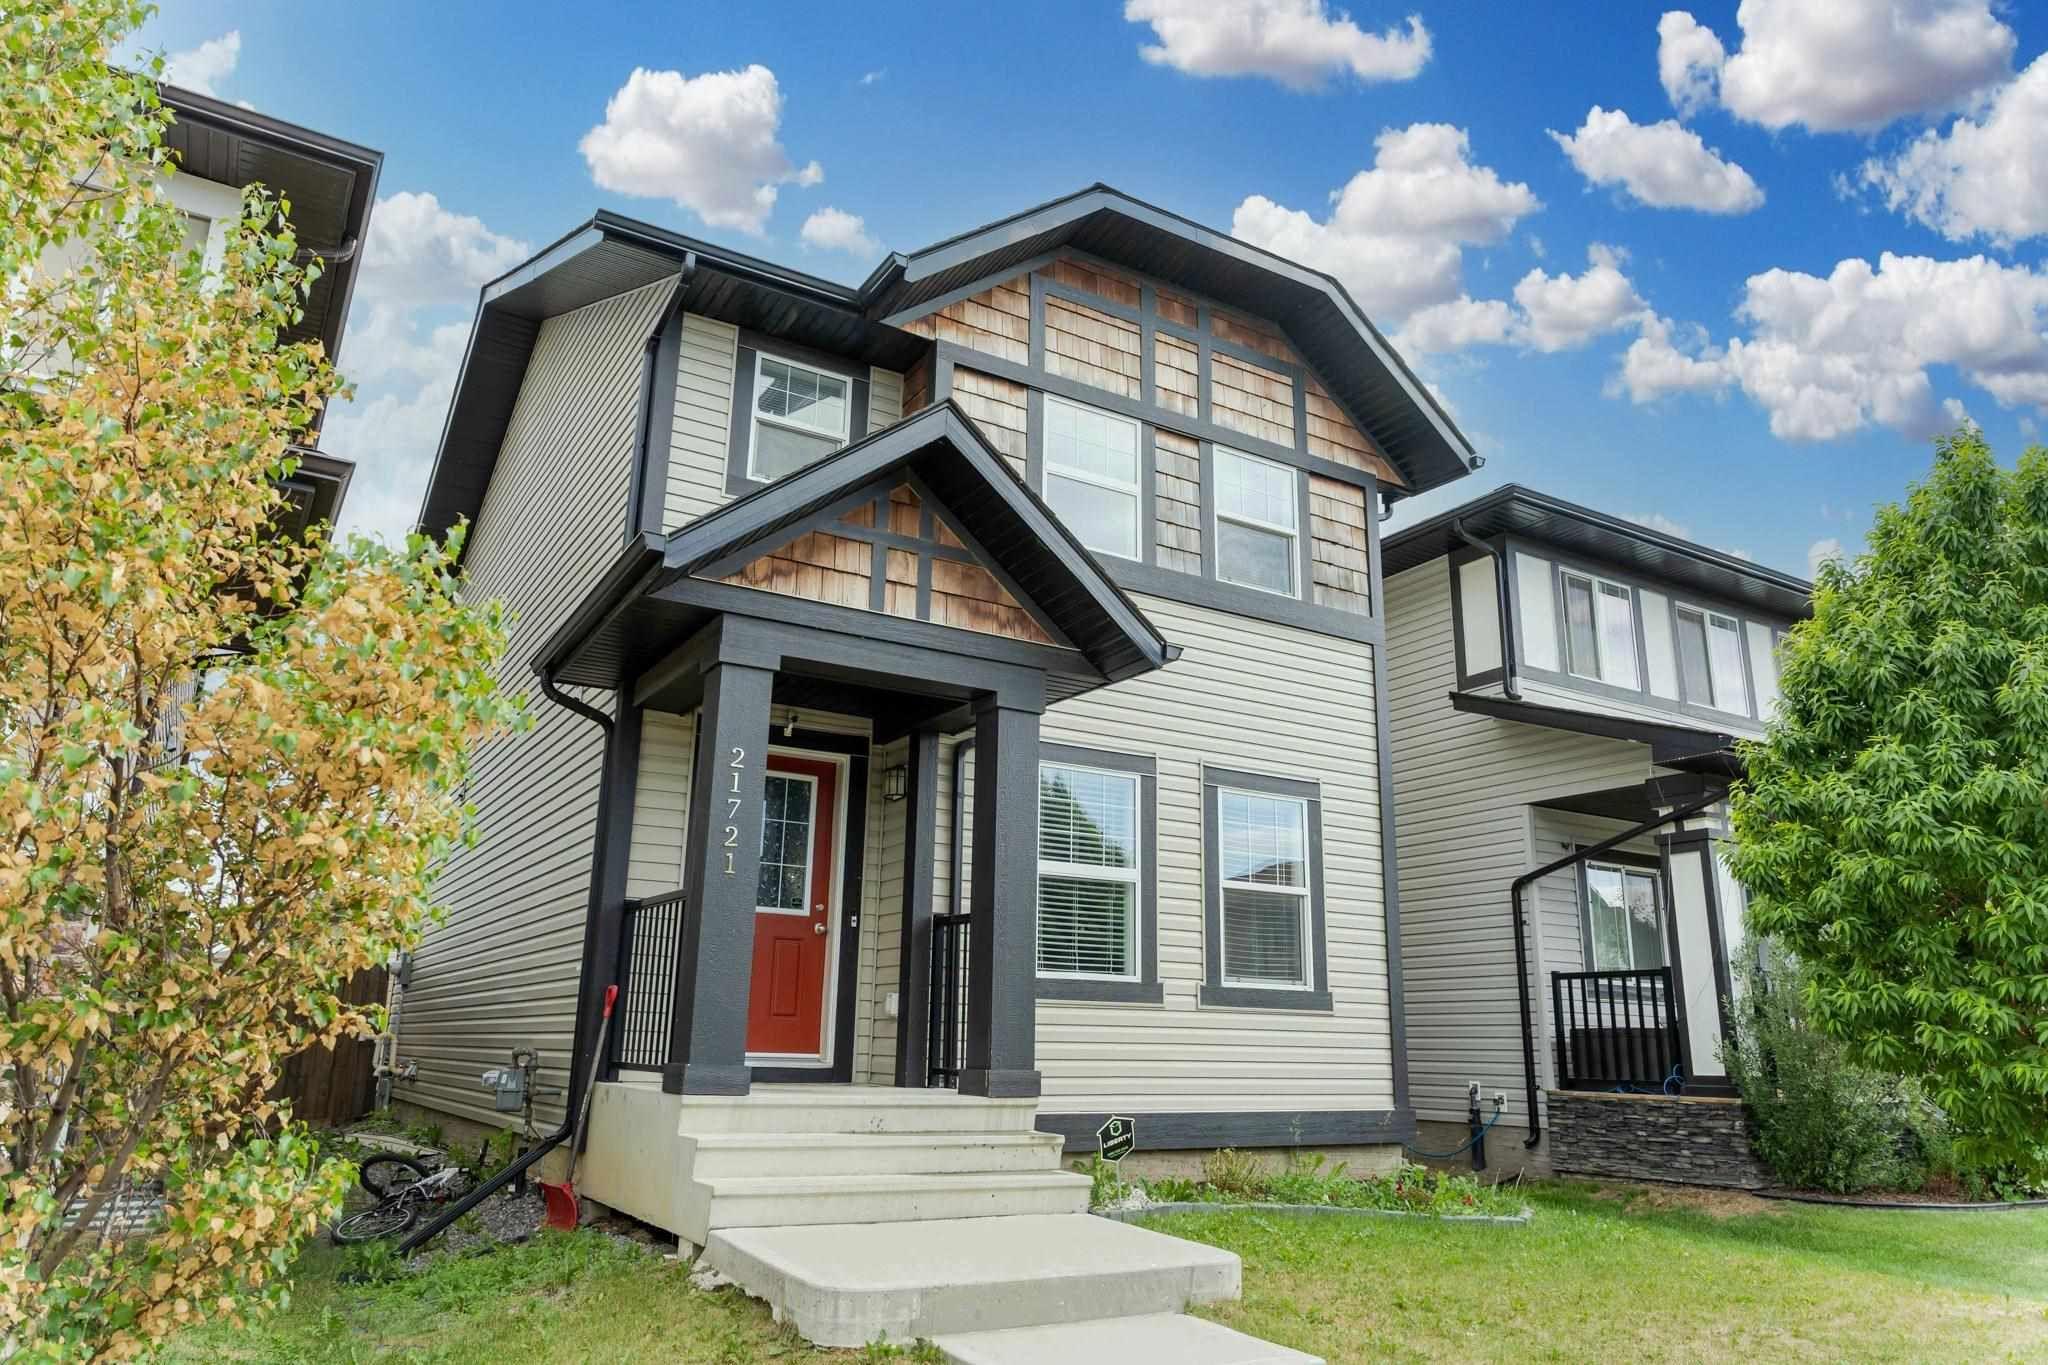 Main Photo: 21721 99A Avenue in Edmonton: Zone 58 House for sale : MLS®# E4255629